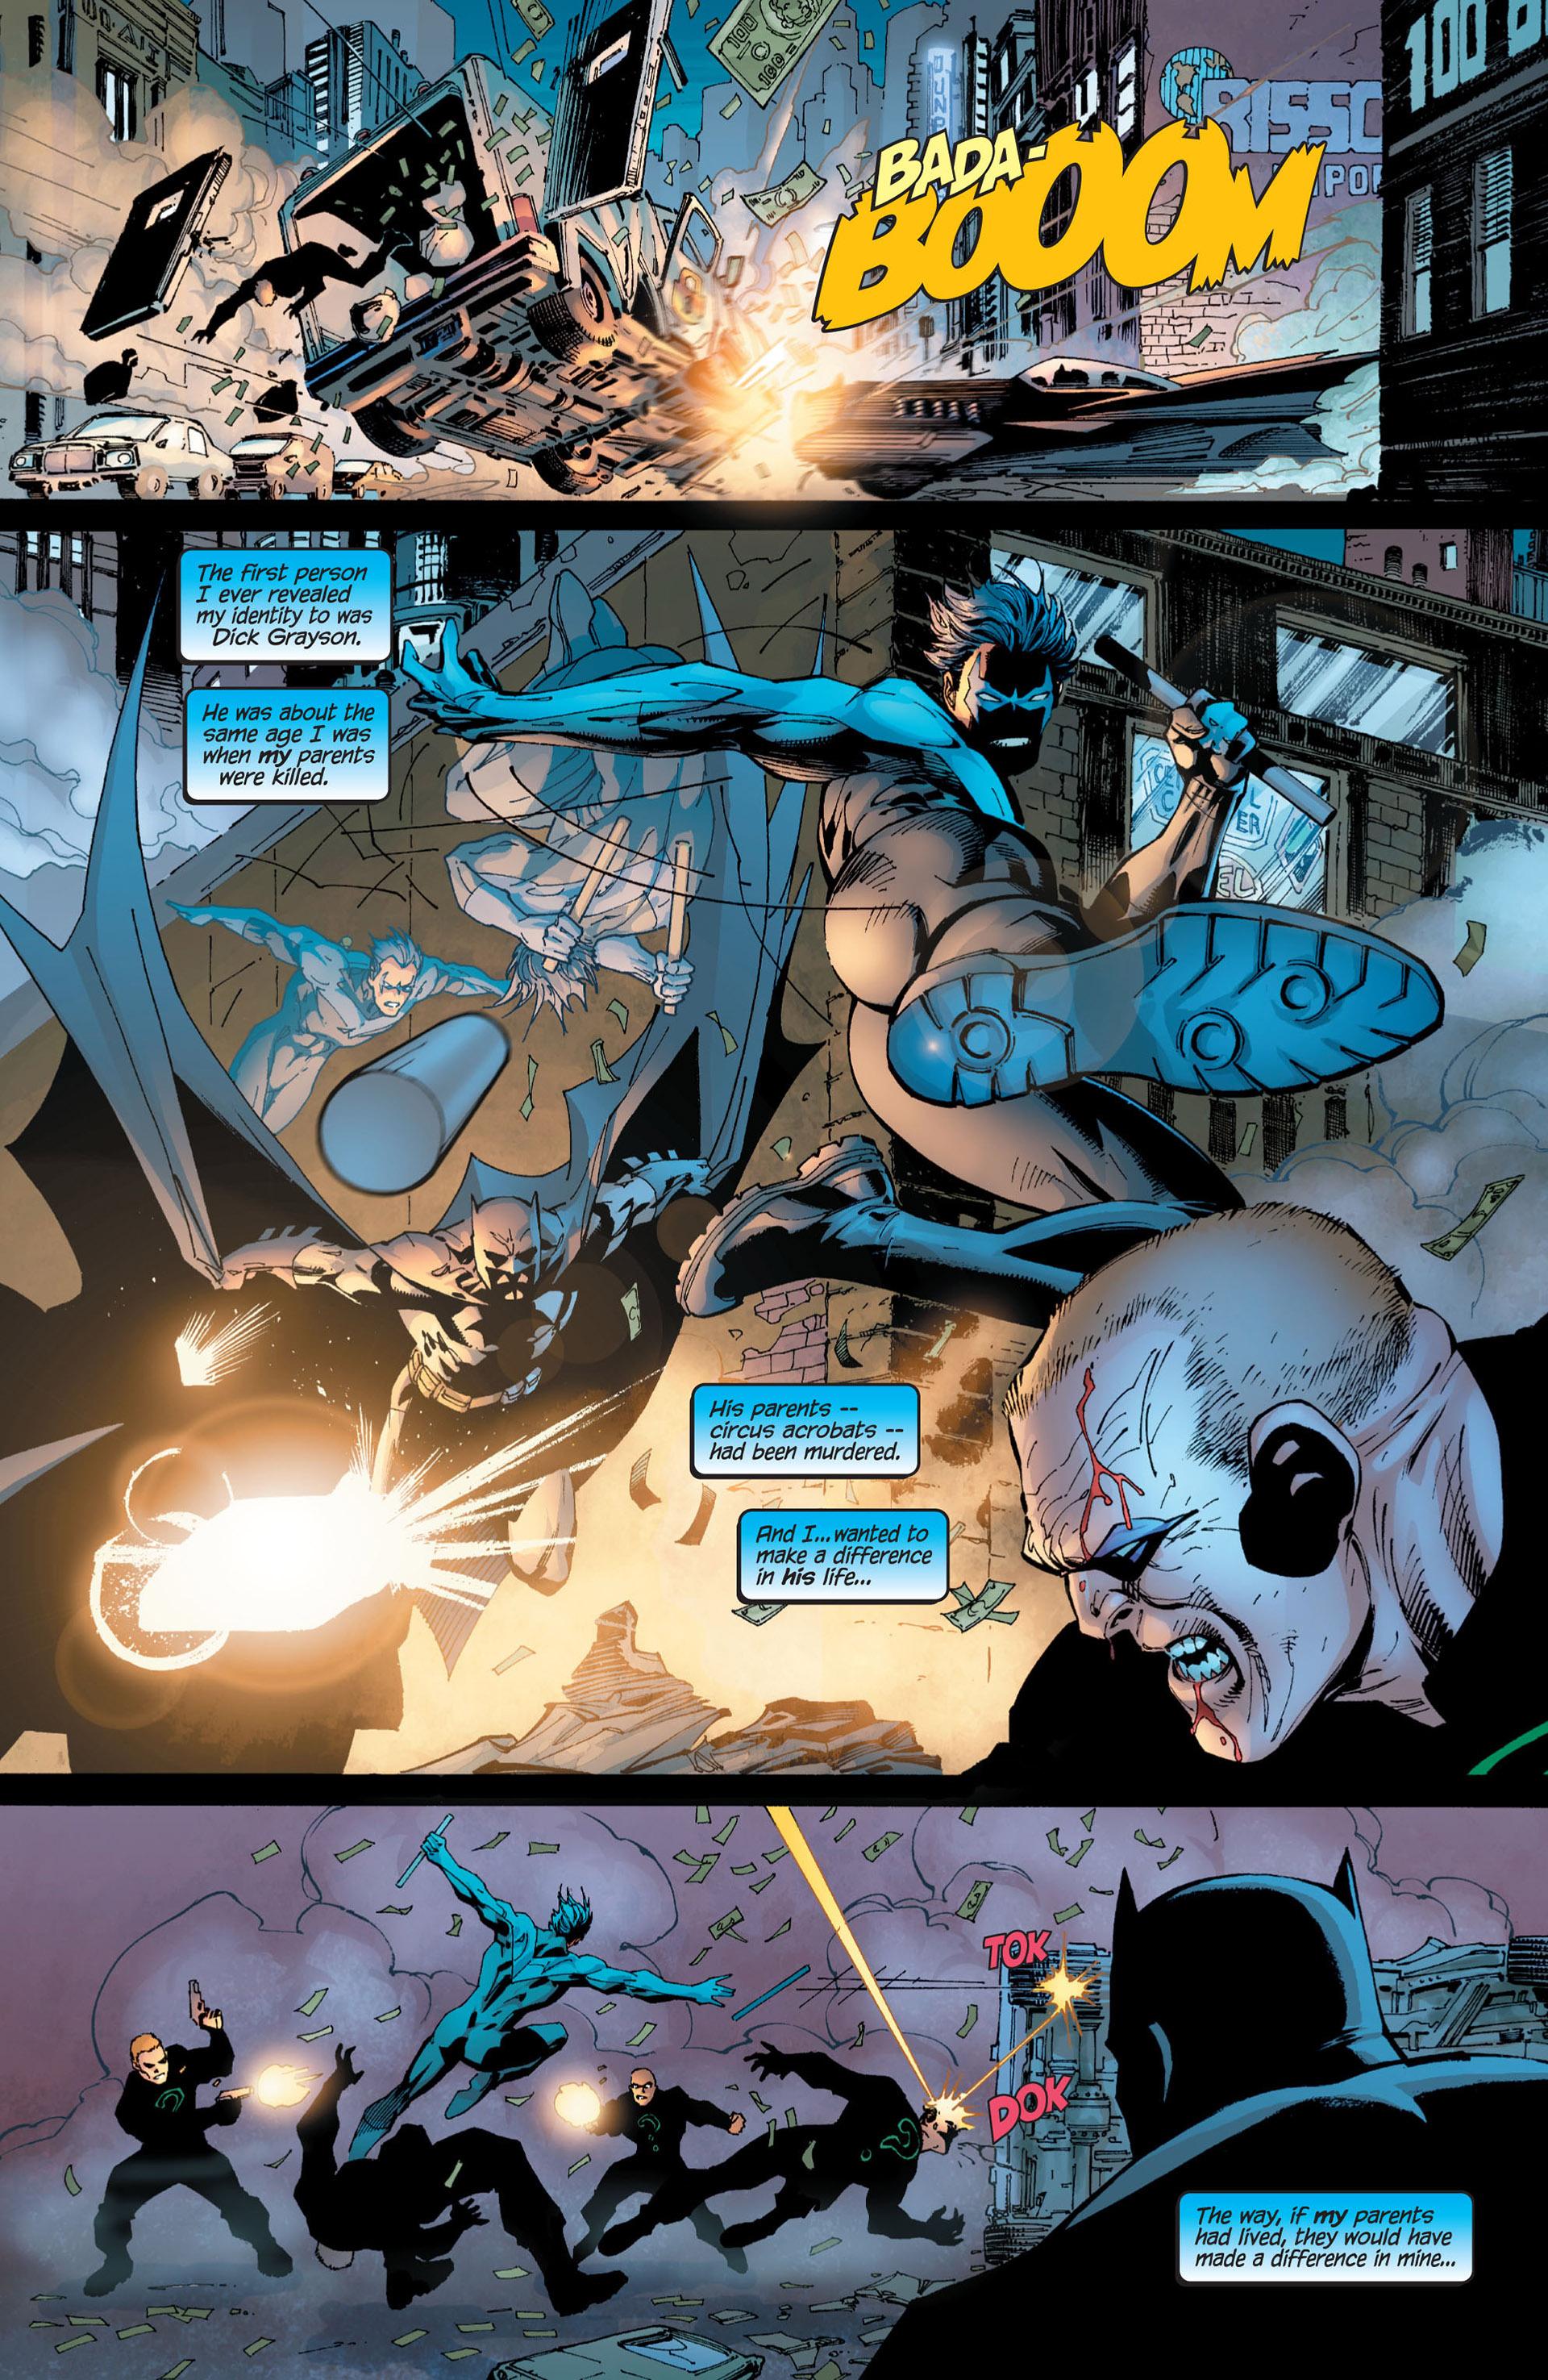 Psychology of Bruce Wayne SF7AWqieUoDav3SAdaTKjWKER5MVd5J_uhDANKYPdOJpY-dHlfUTrbTCW1H3IxgIKIKAv1_piRnL=s0